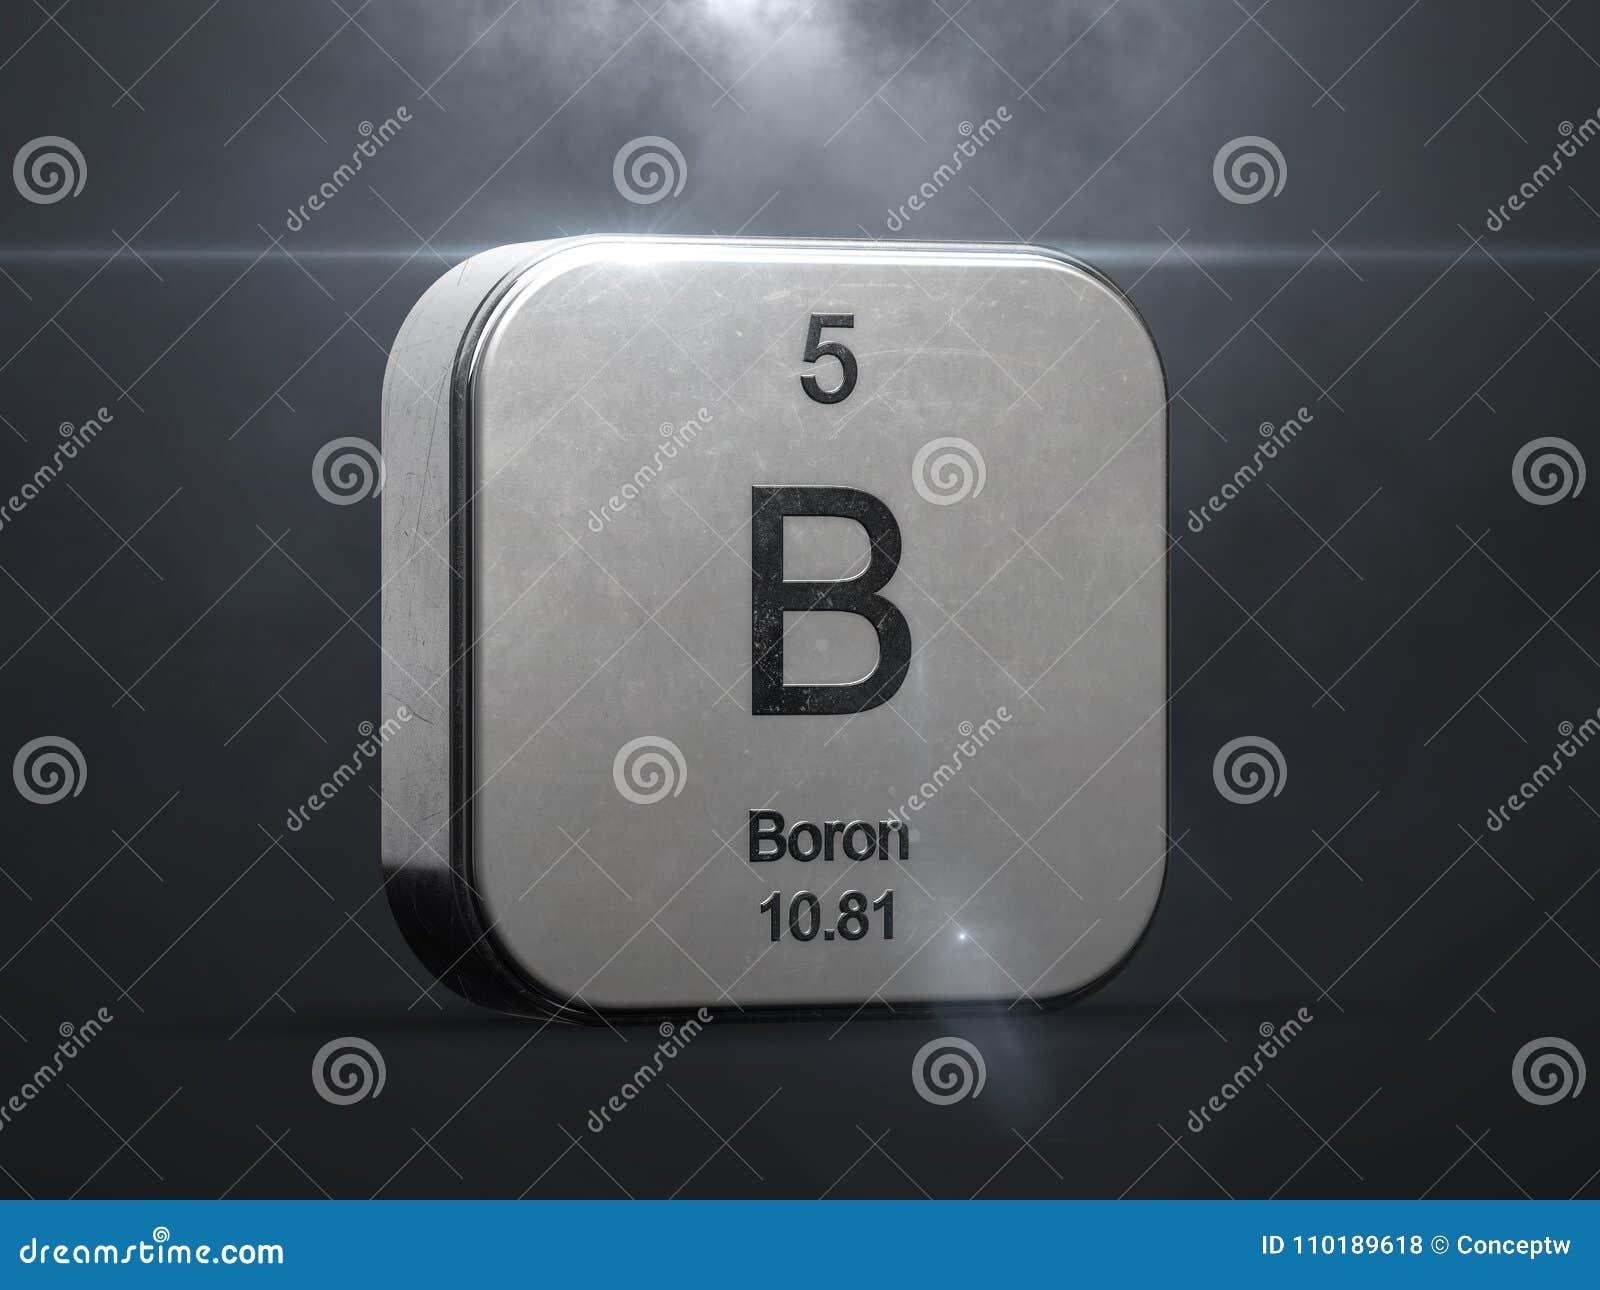 Elemento del boro de la tabla peridica stock de ilustracin download elemento del boro de la tabla peridica stock de ilustracin ilustracin de ciencia urtaz Images